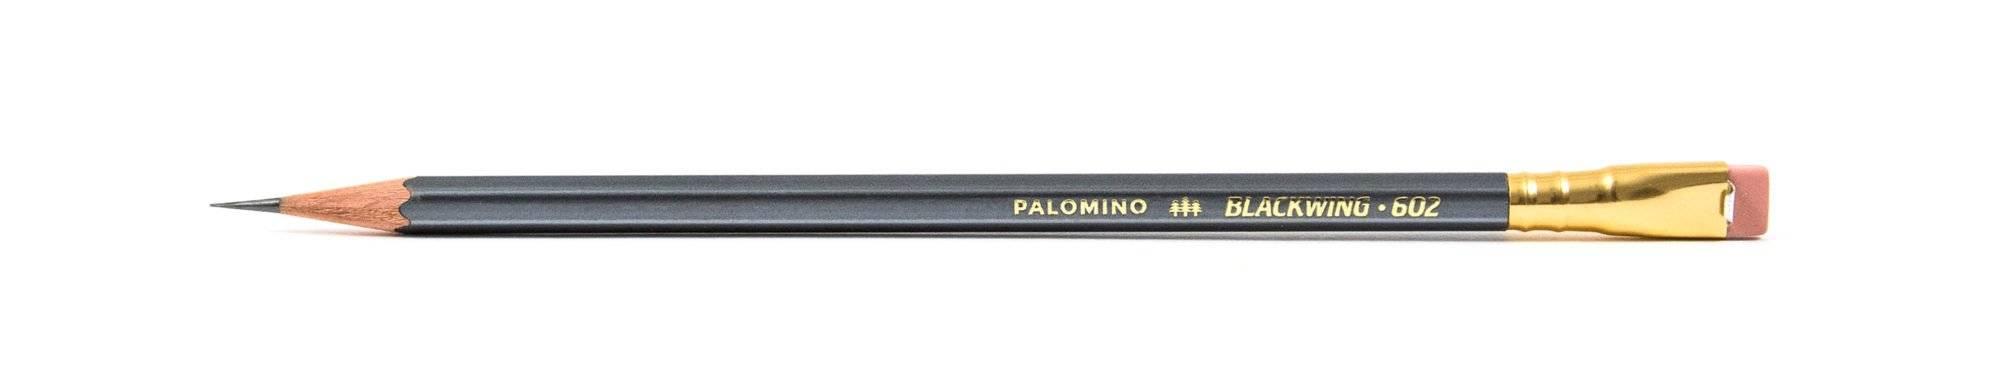 Blackwing 602